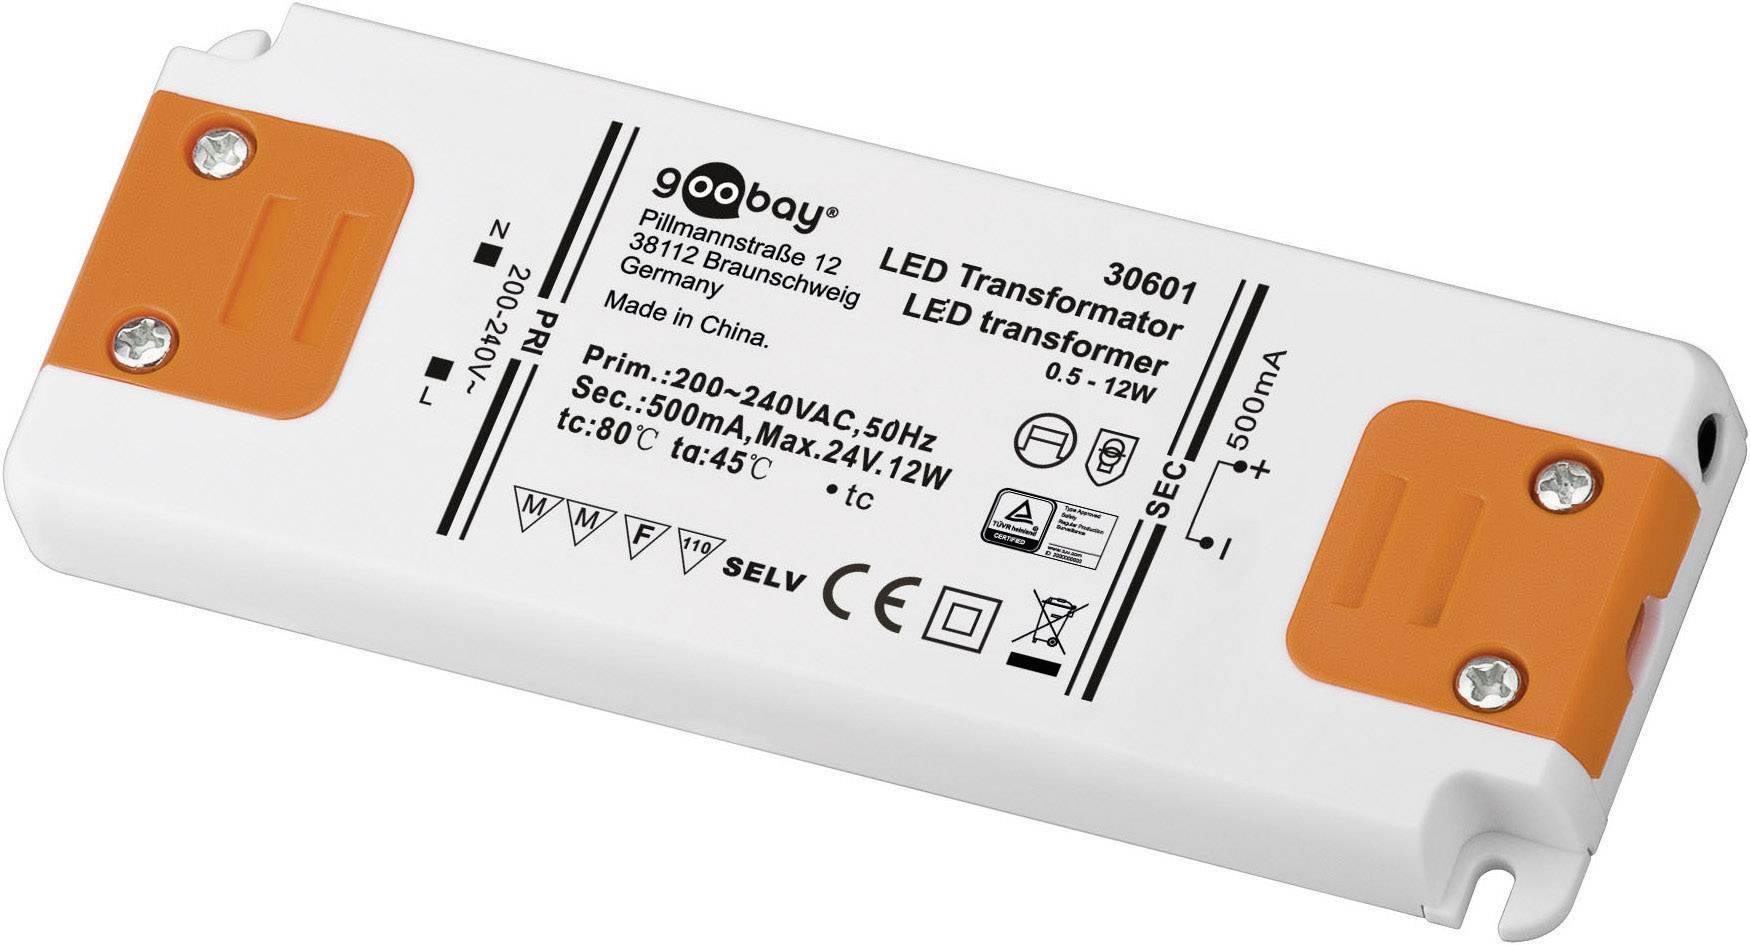 Vstavateľný LED driver Goobay SET CC 500-12 LED, 12 W (max), 0.5 A, 0 - 24 V/DC